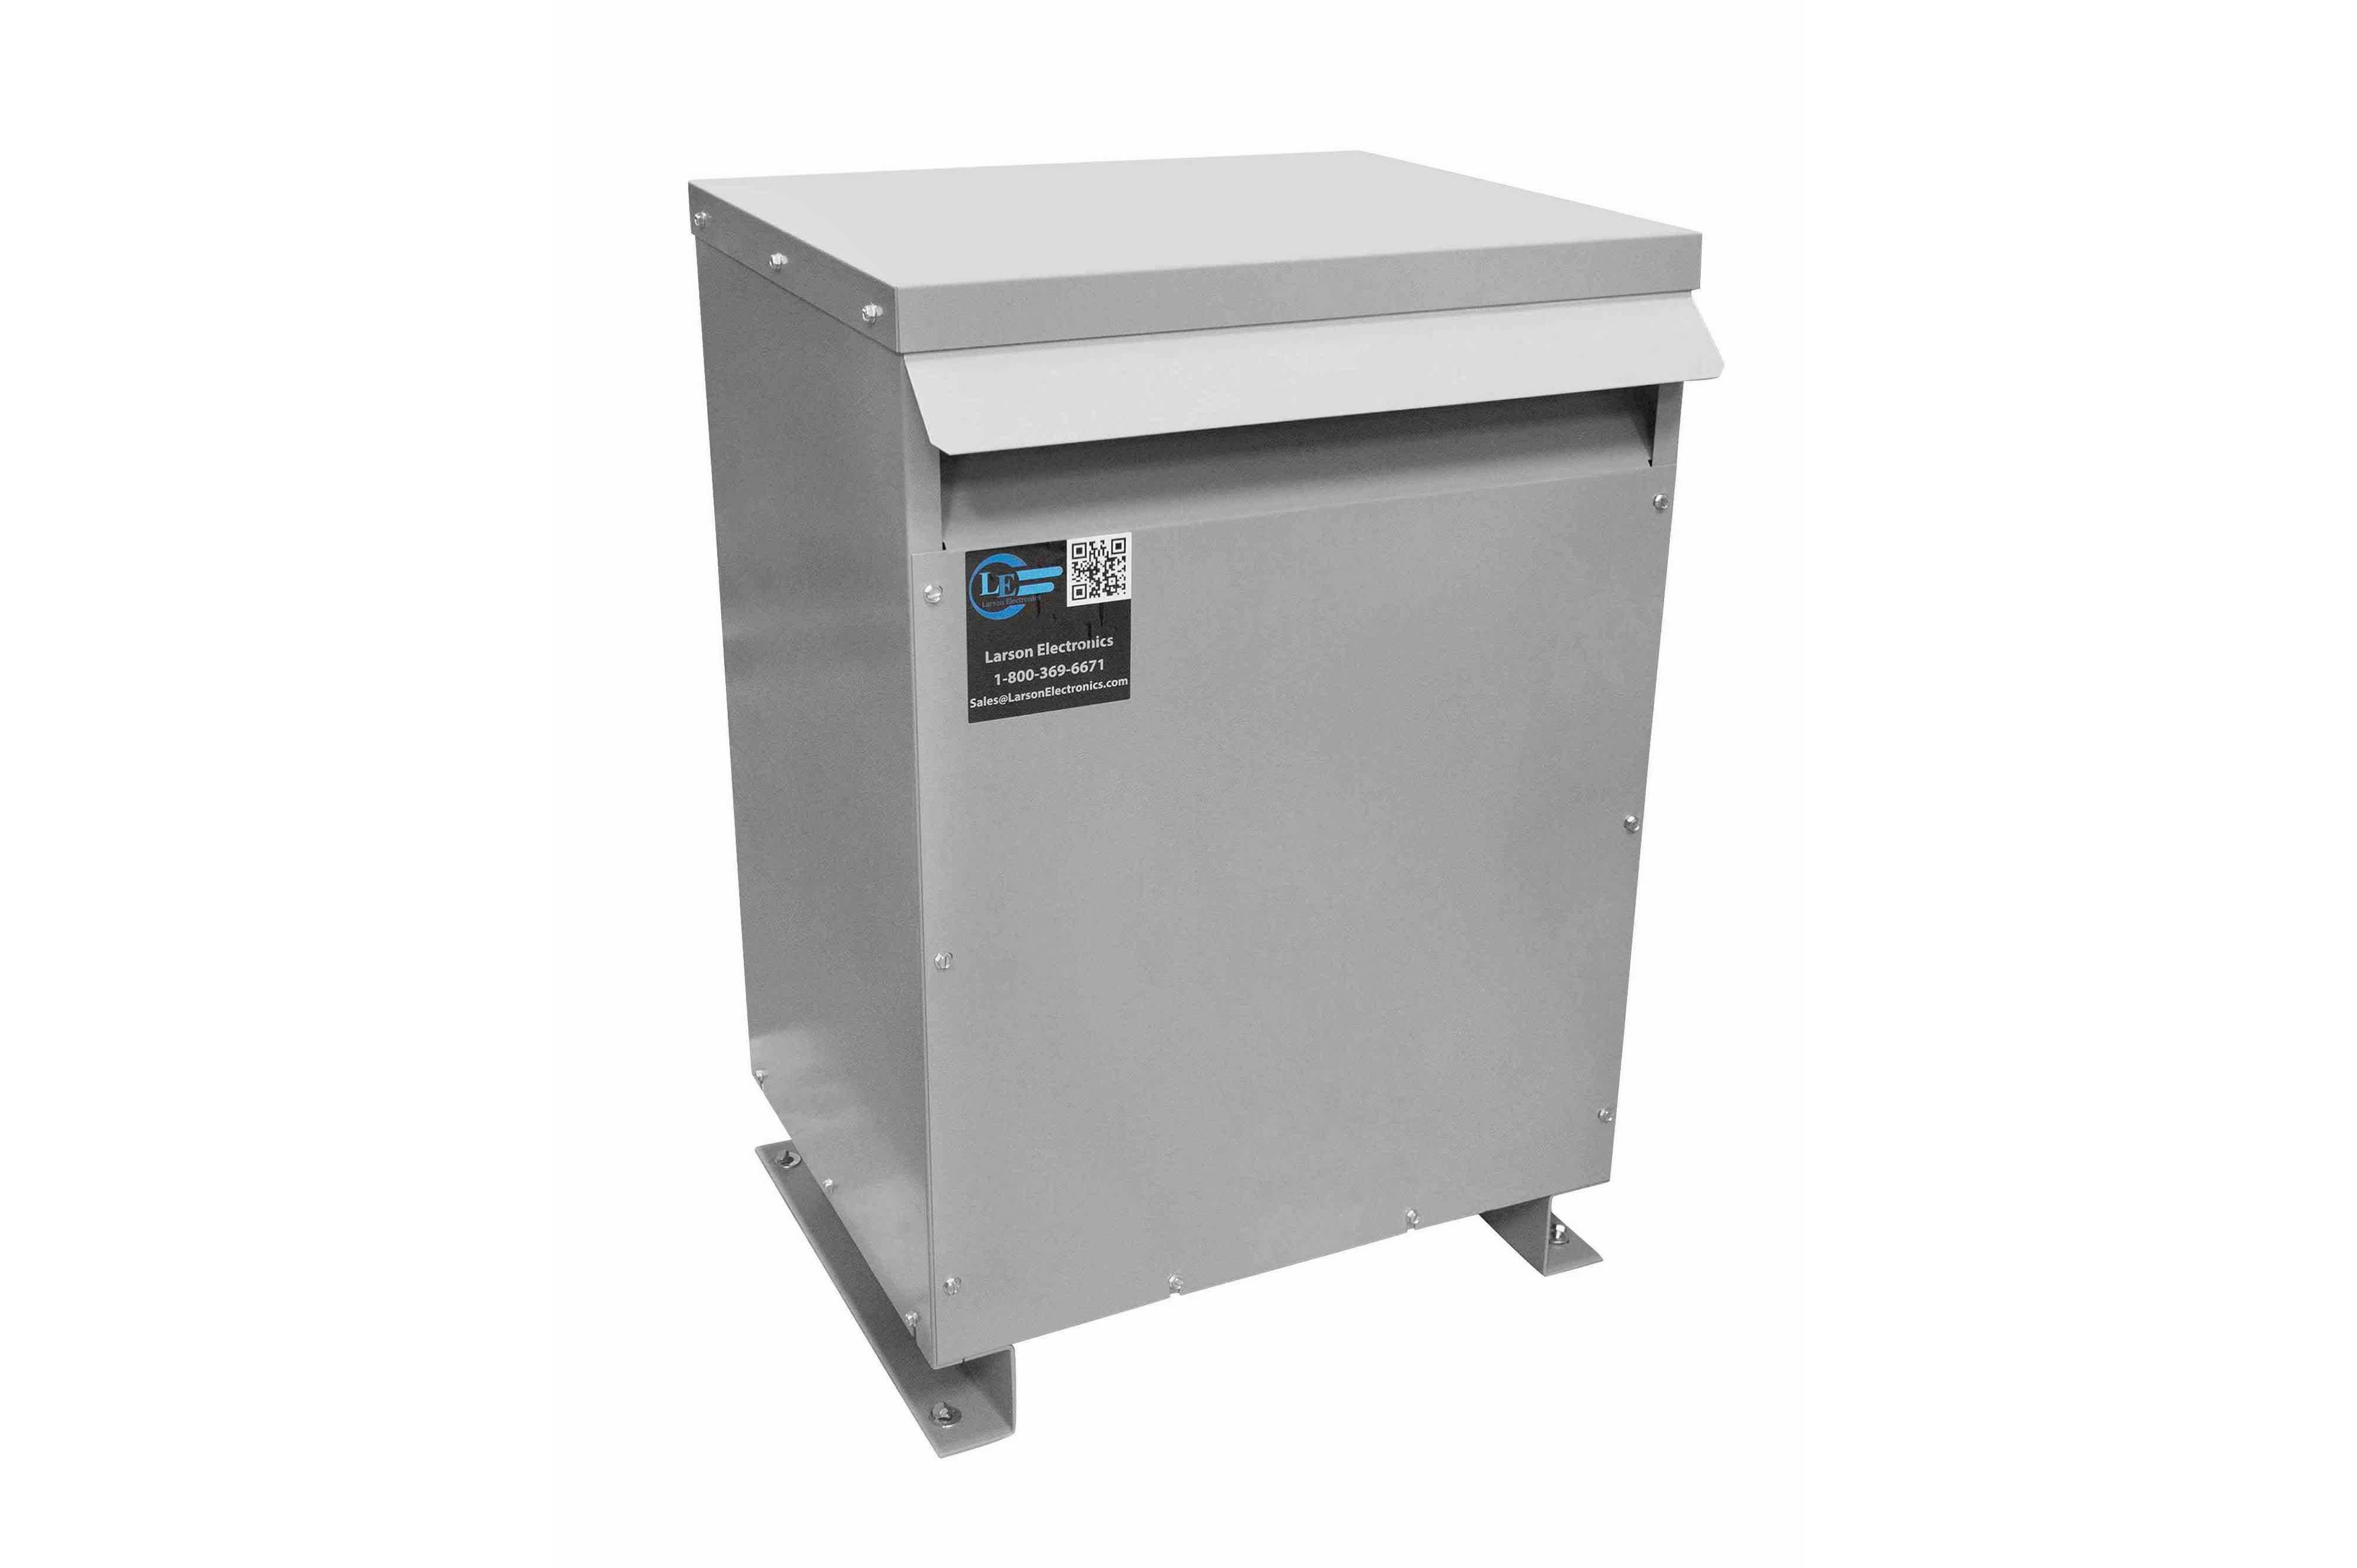 9 kVA 3PH Isolation Transformer, 380V Wye Primary, 240V/120 Delta Secondary, N3R, Ventilated, 60 Hz